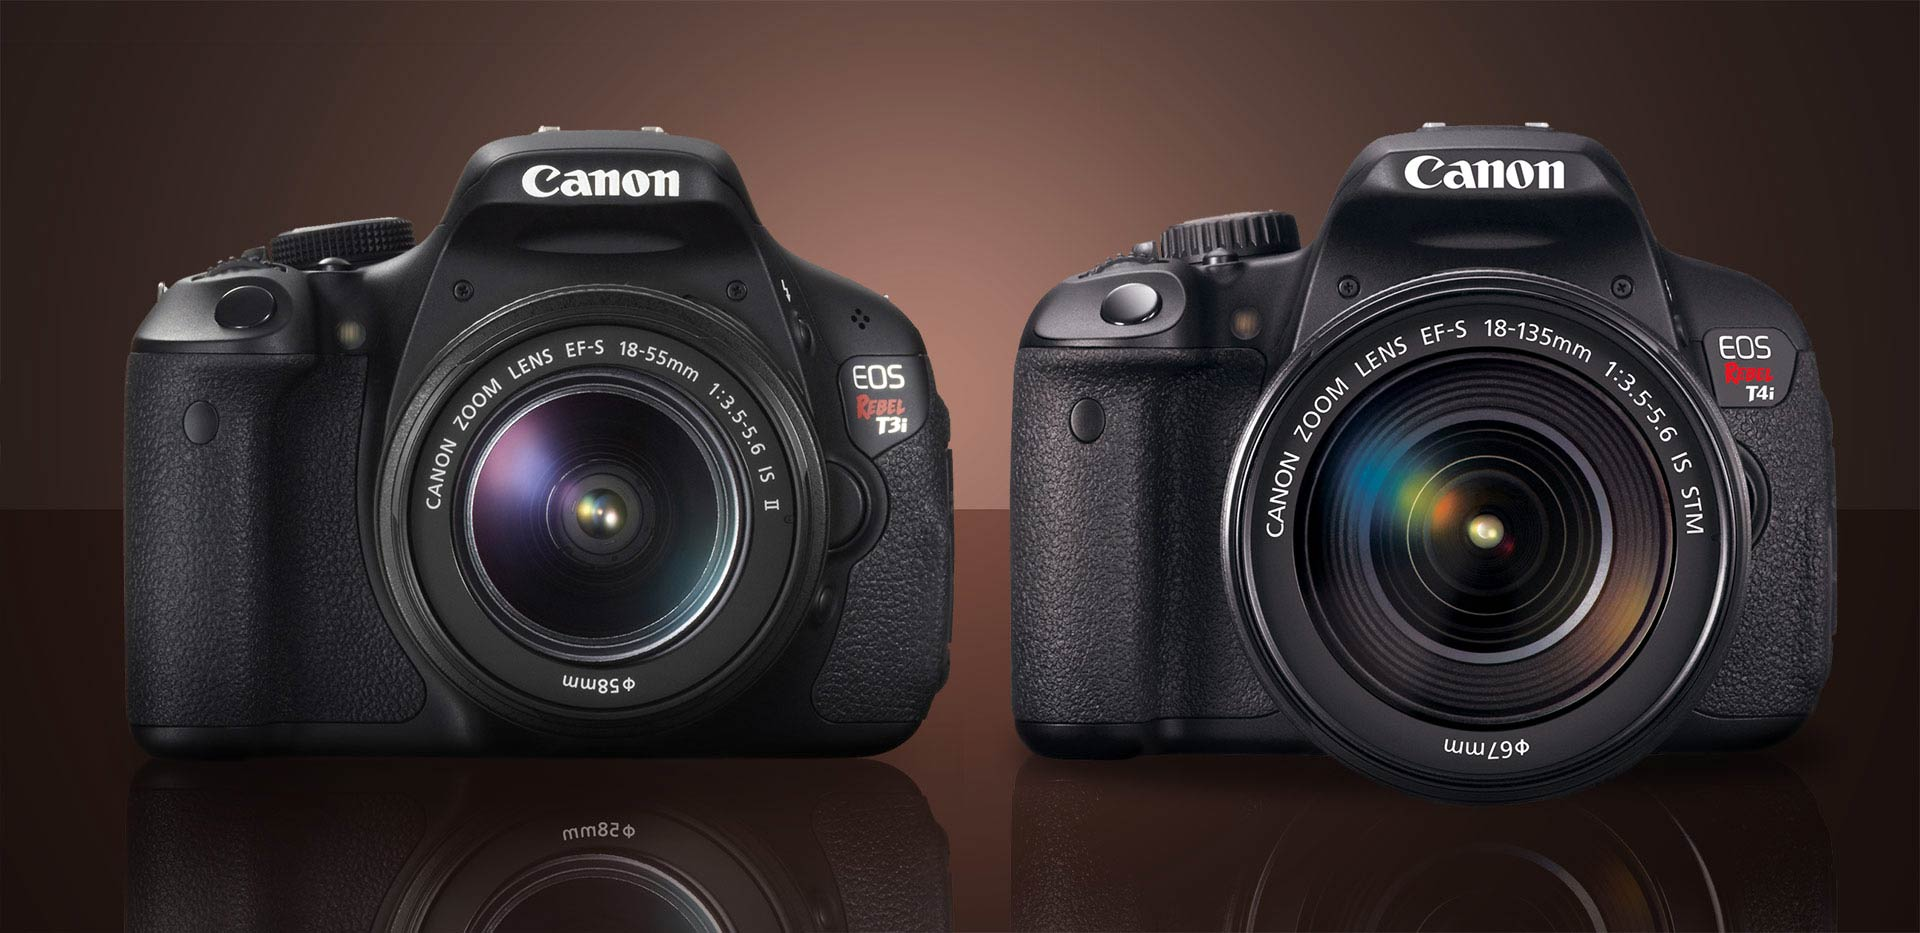 Canon T4i vs T3i